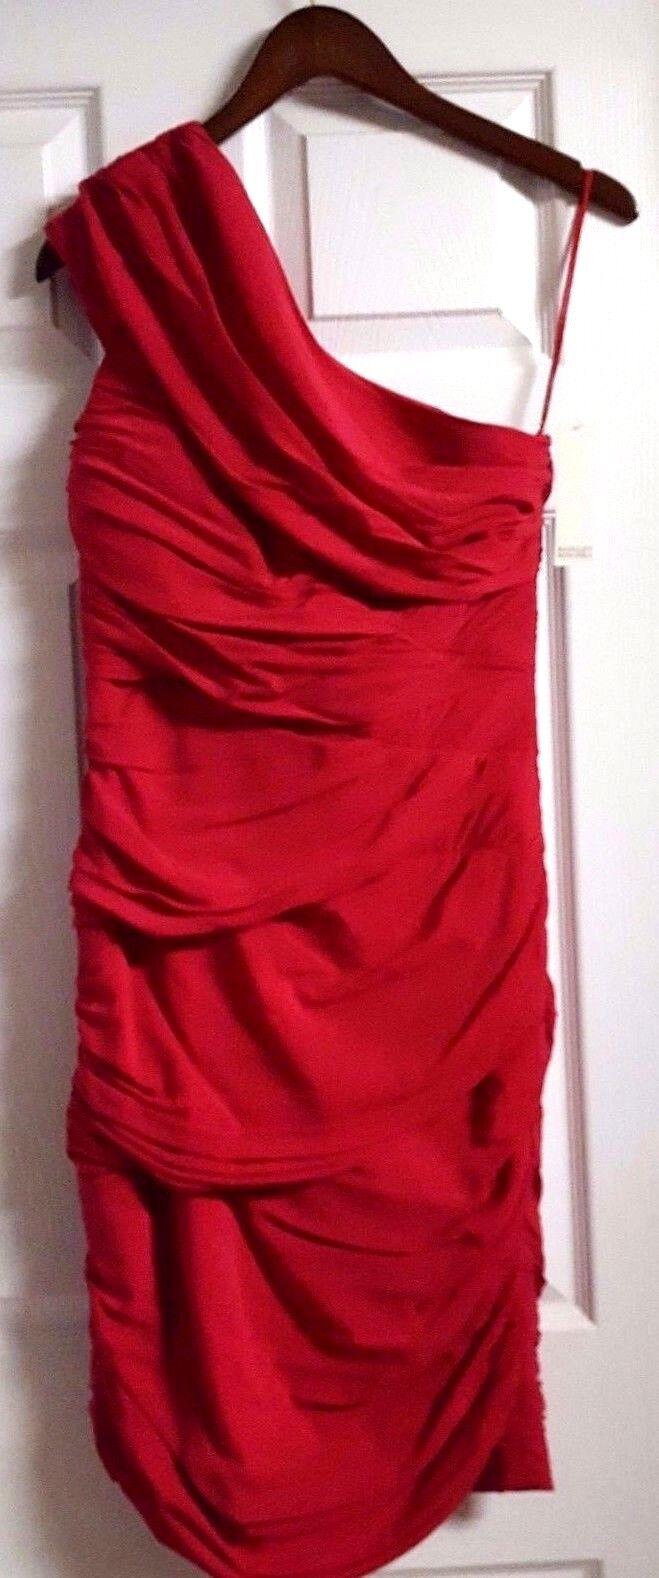 Ladies NWT BADGLEY MISCHKA one shoulder ruched cocktail dress size 6